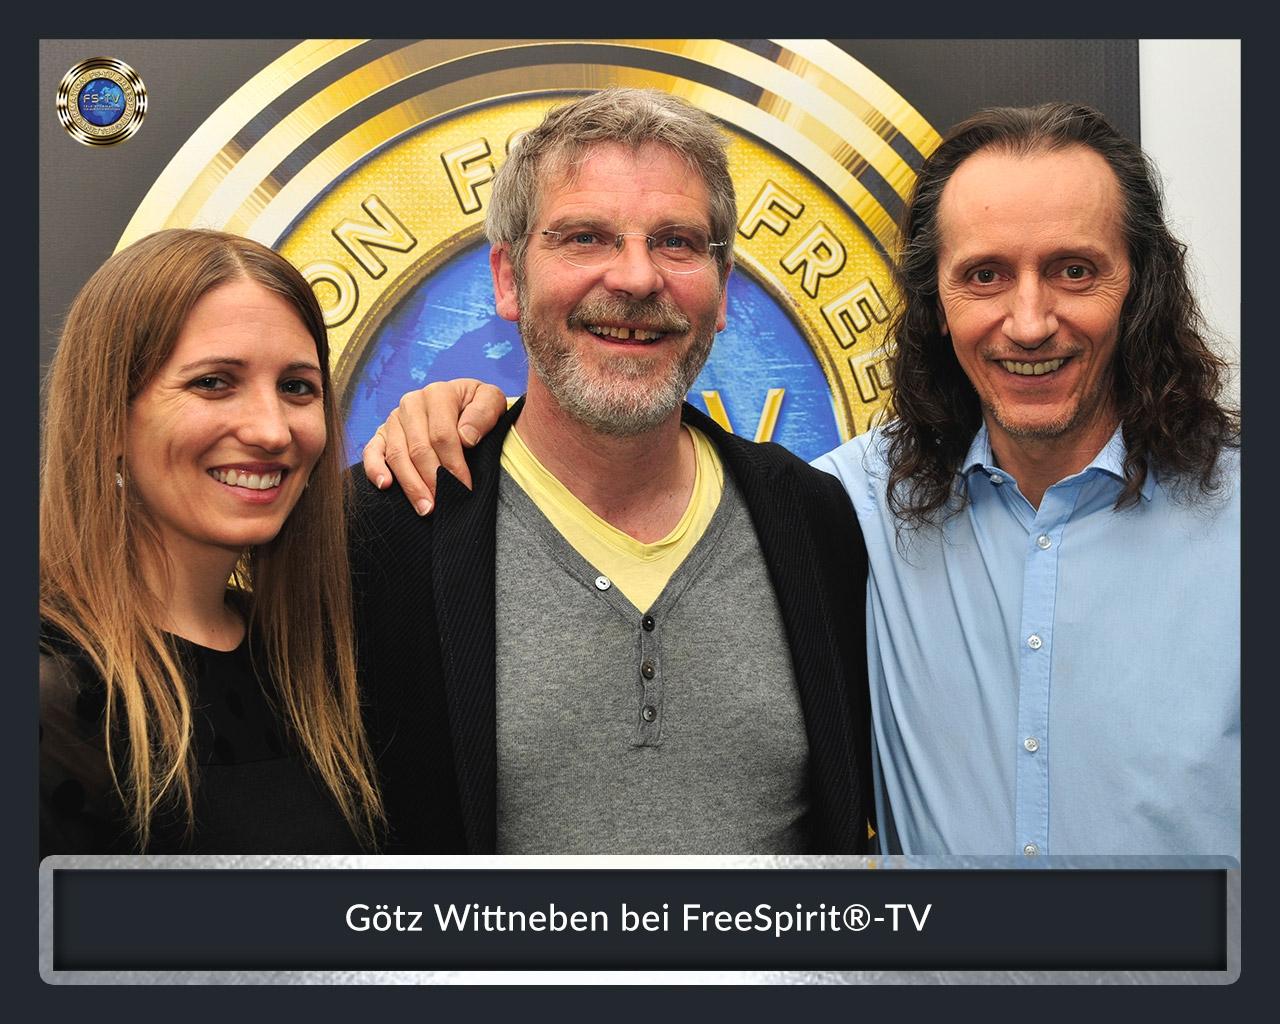 FS-TV-Bildergallerie-Götz-Wittneben-3